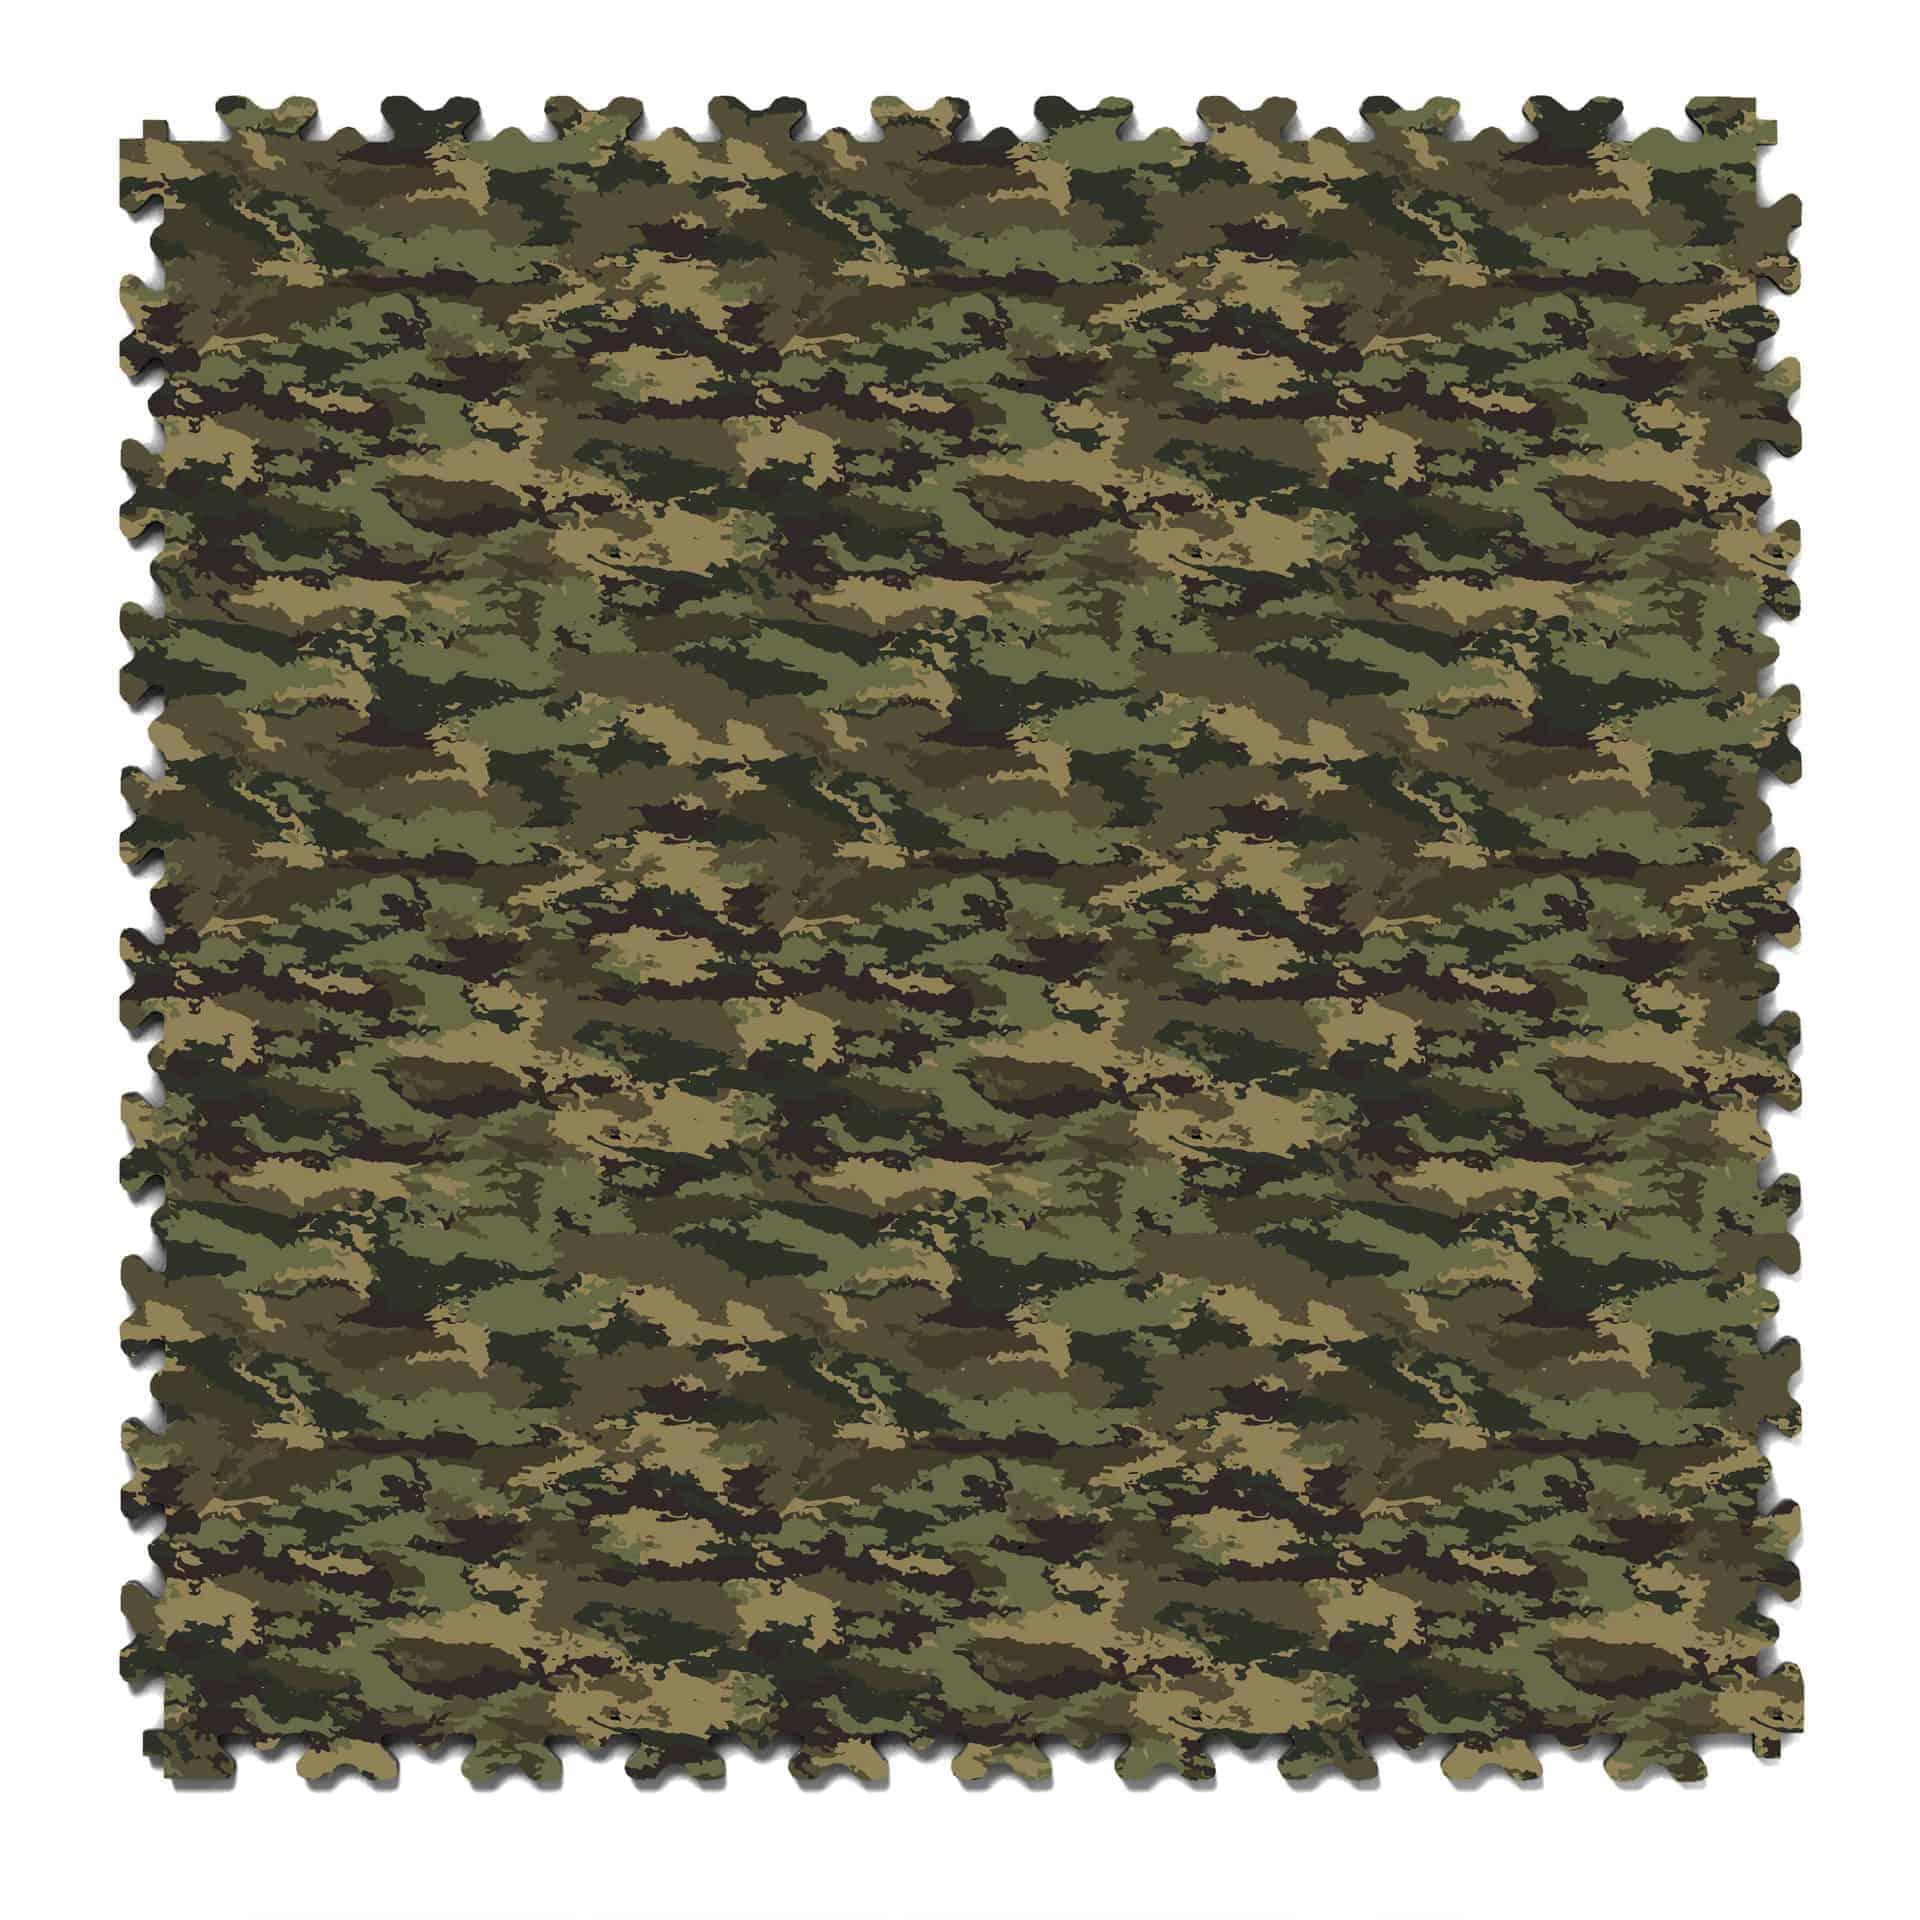 Impression Camouflage